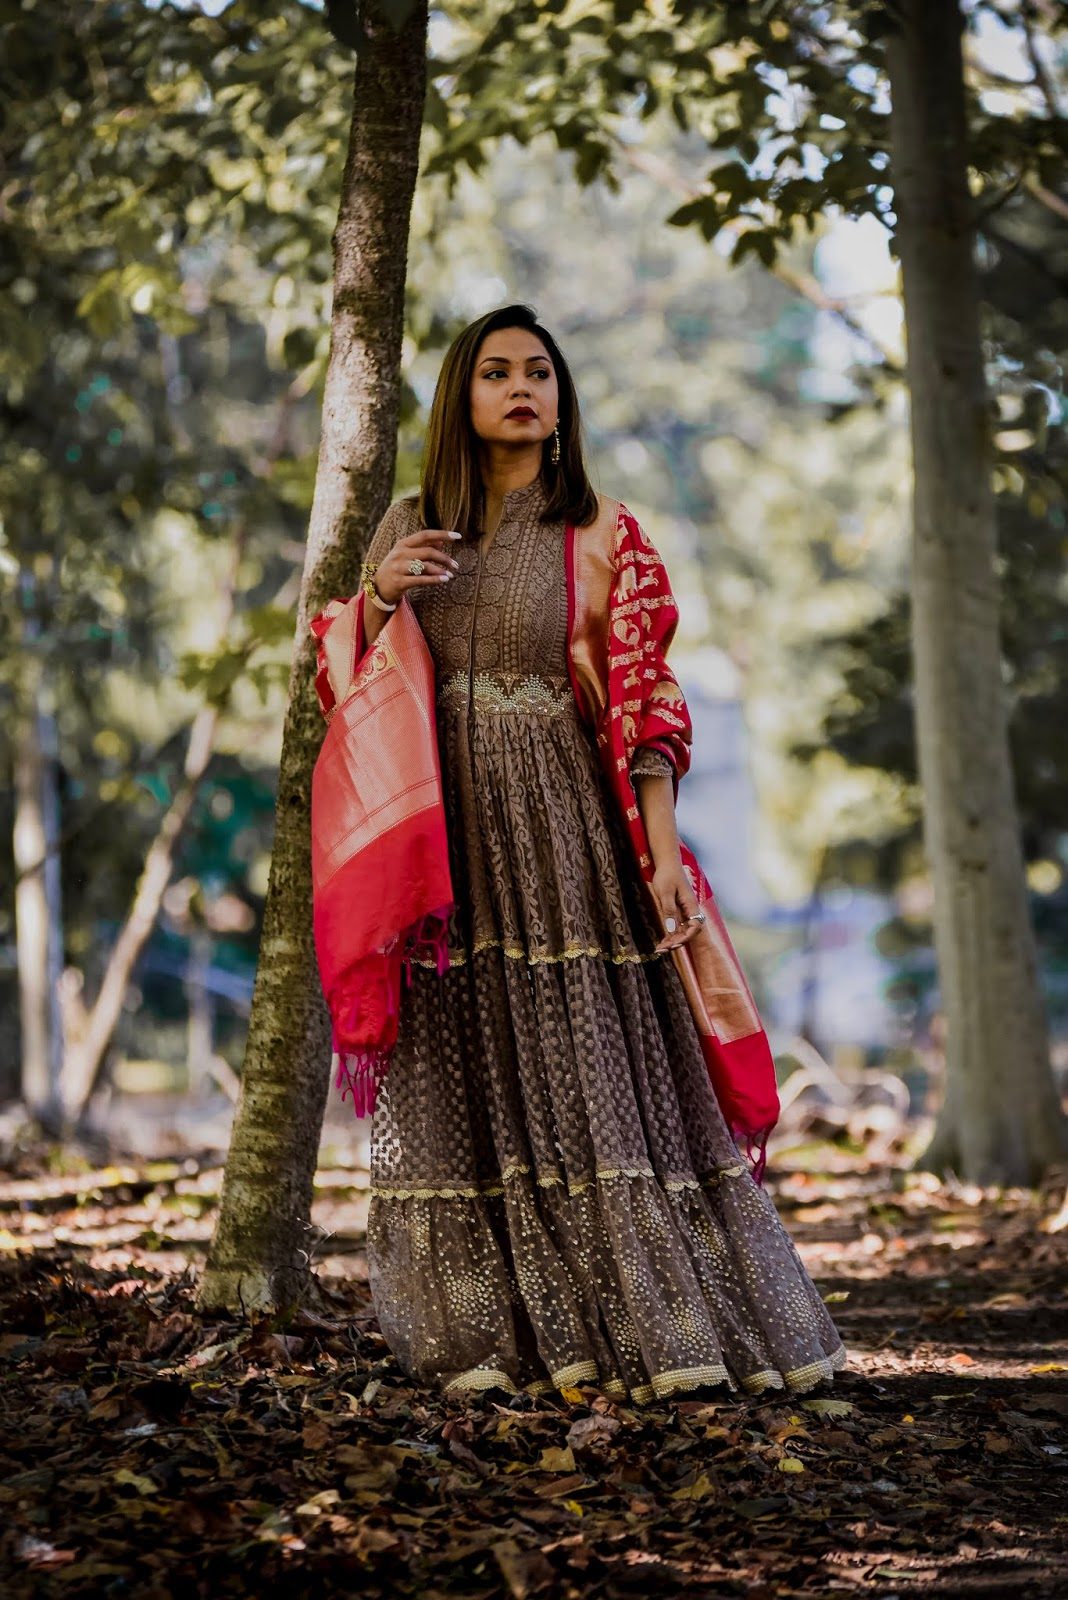 Indian fashion, banarasi dupatta, maxi dress, wedding fashion, traditional look, fashion blogger, pink dupatta, myriad musings, happy diwali, diwali outfit, saumya shiohare